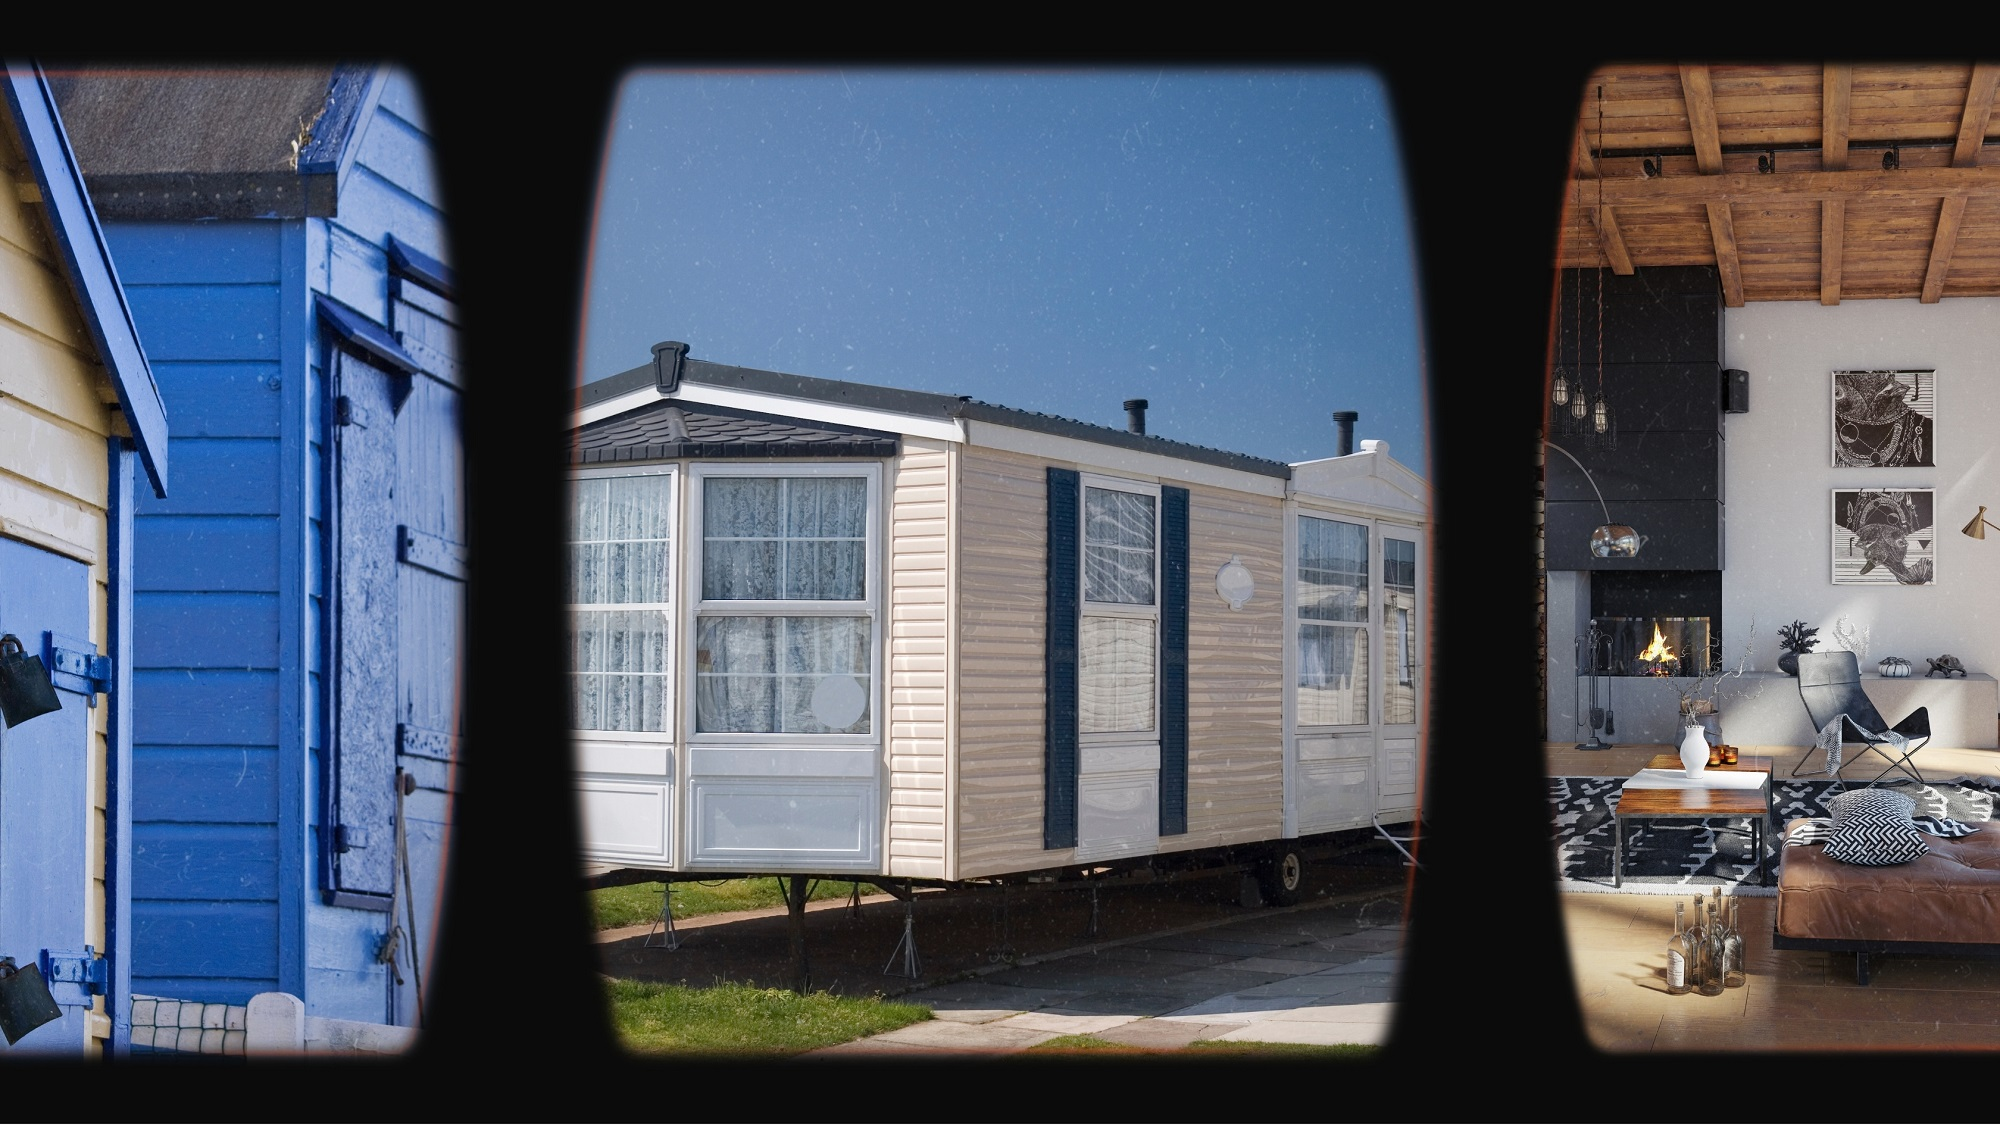 Chalets or Caravans